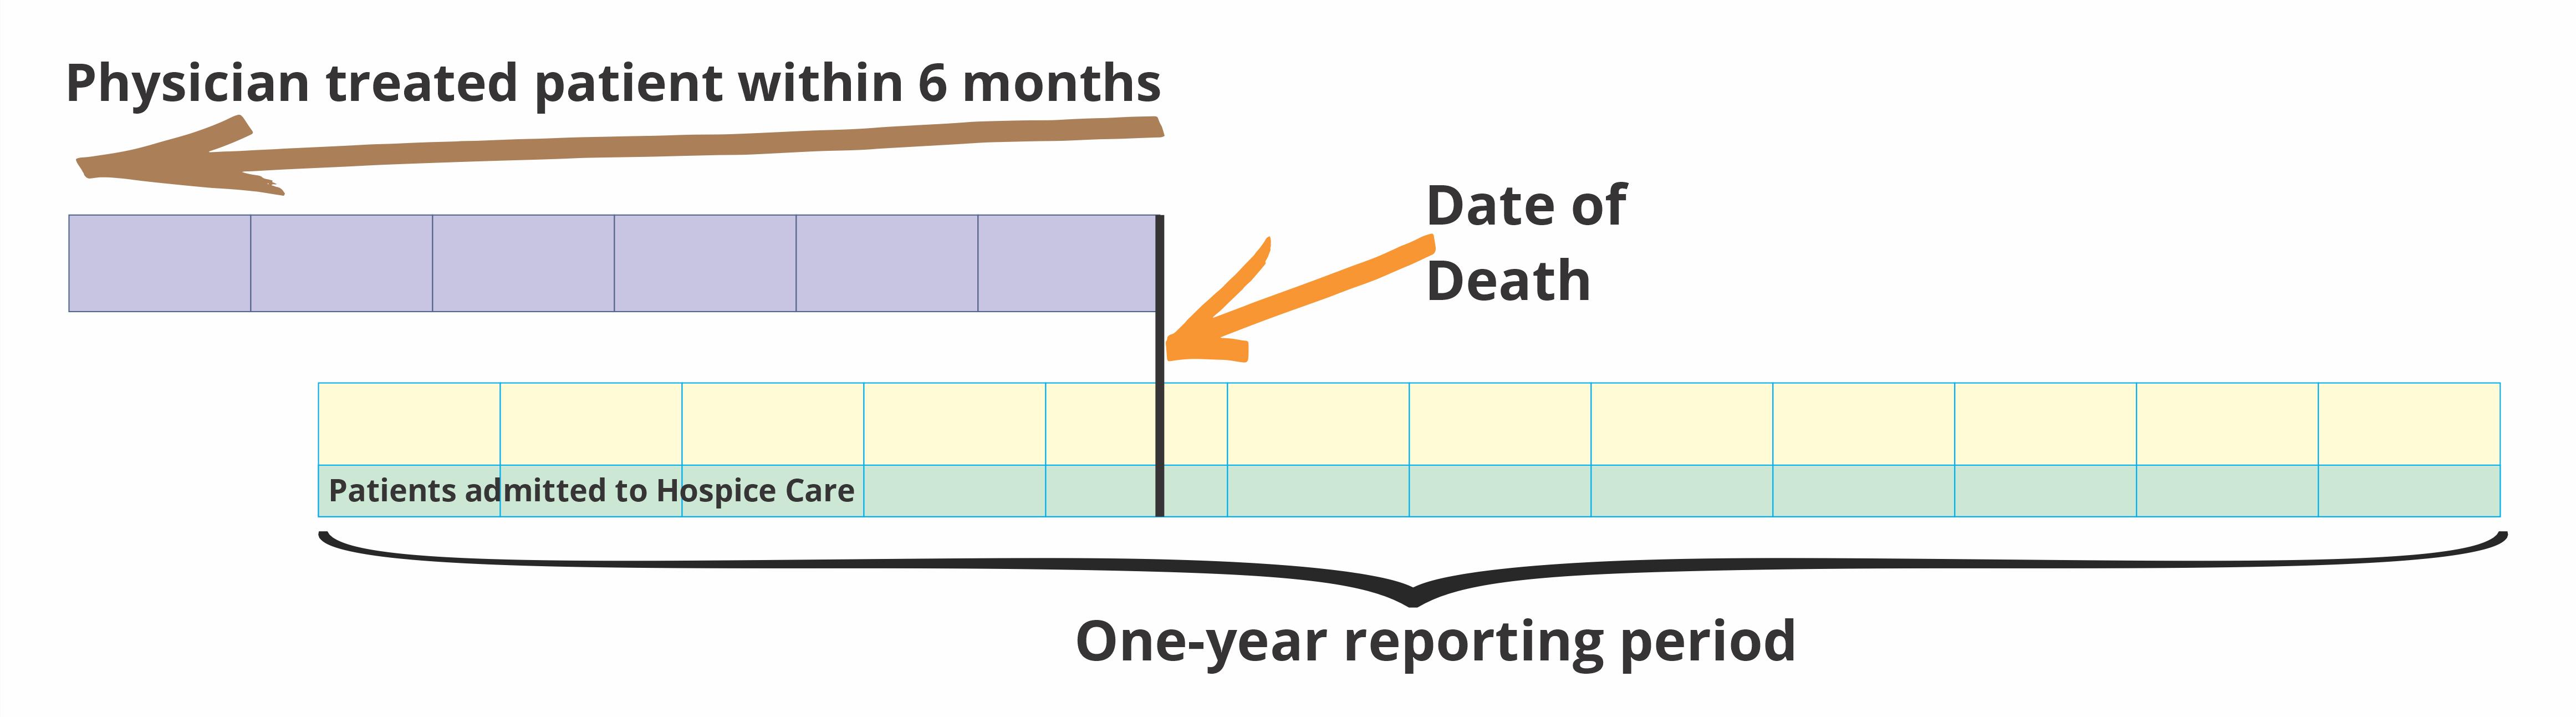 HospiceUtilizationMortalities.png